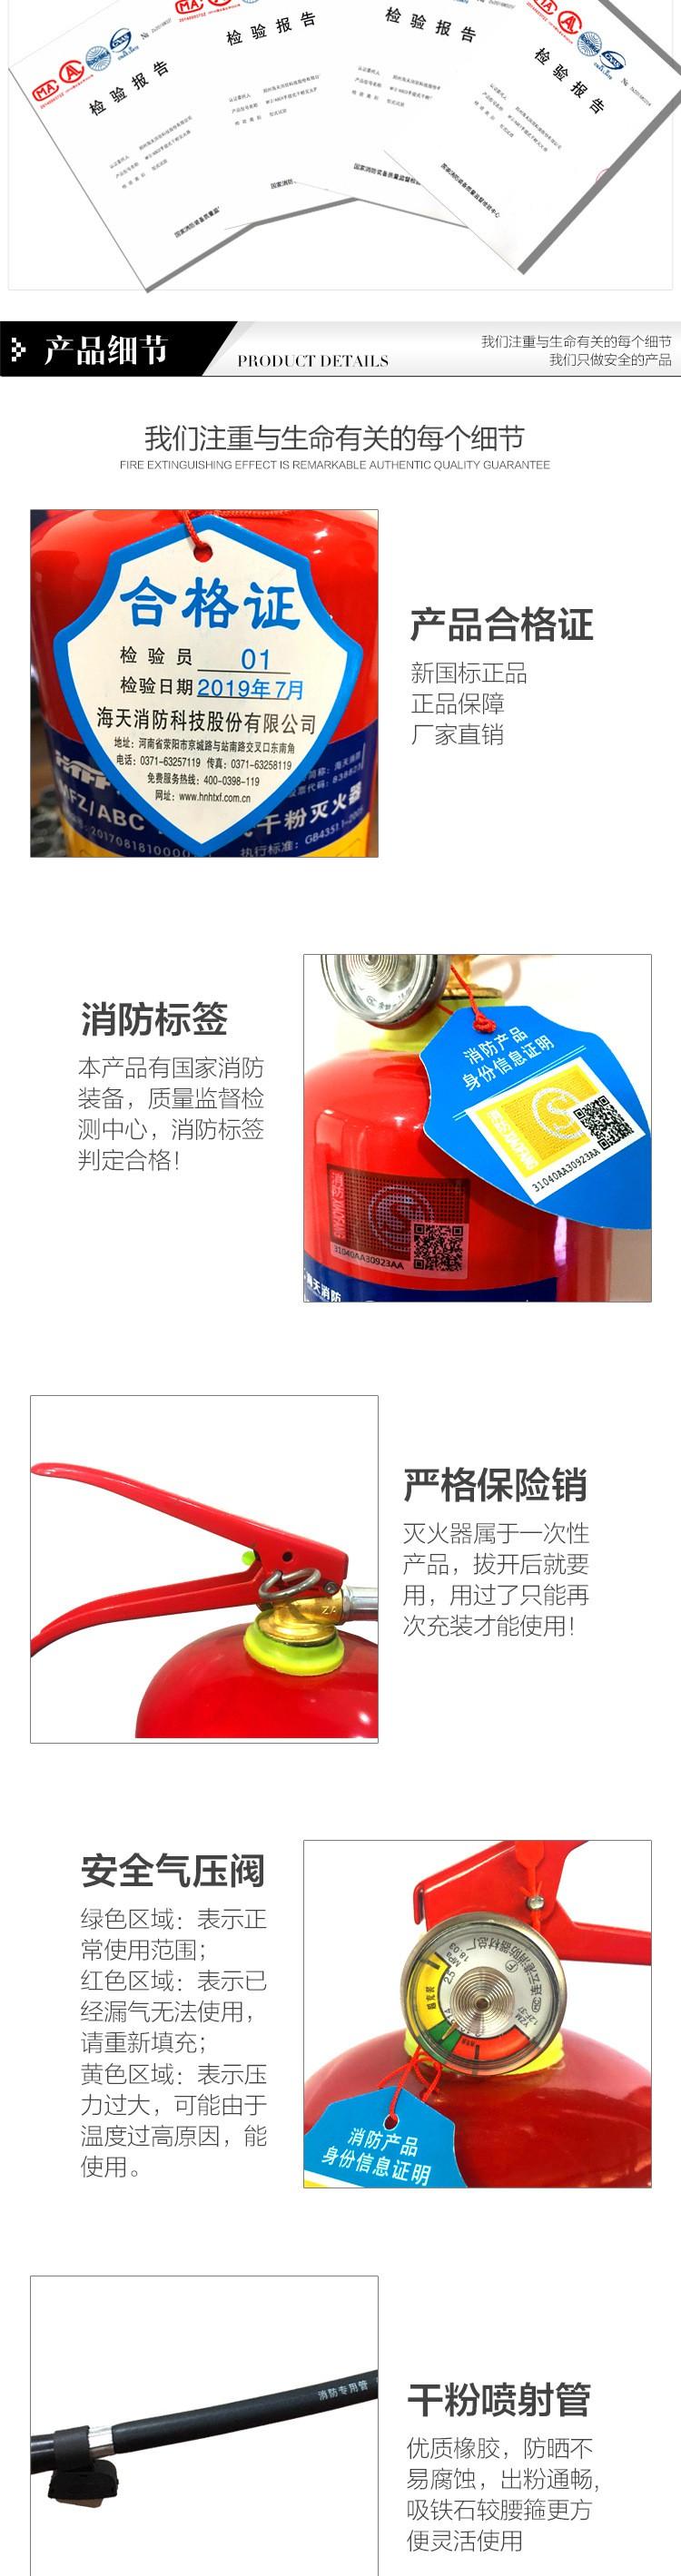 MFZ/ABC4手提式干粉灭火器图片10